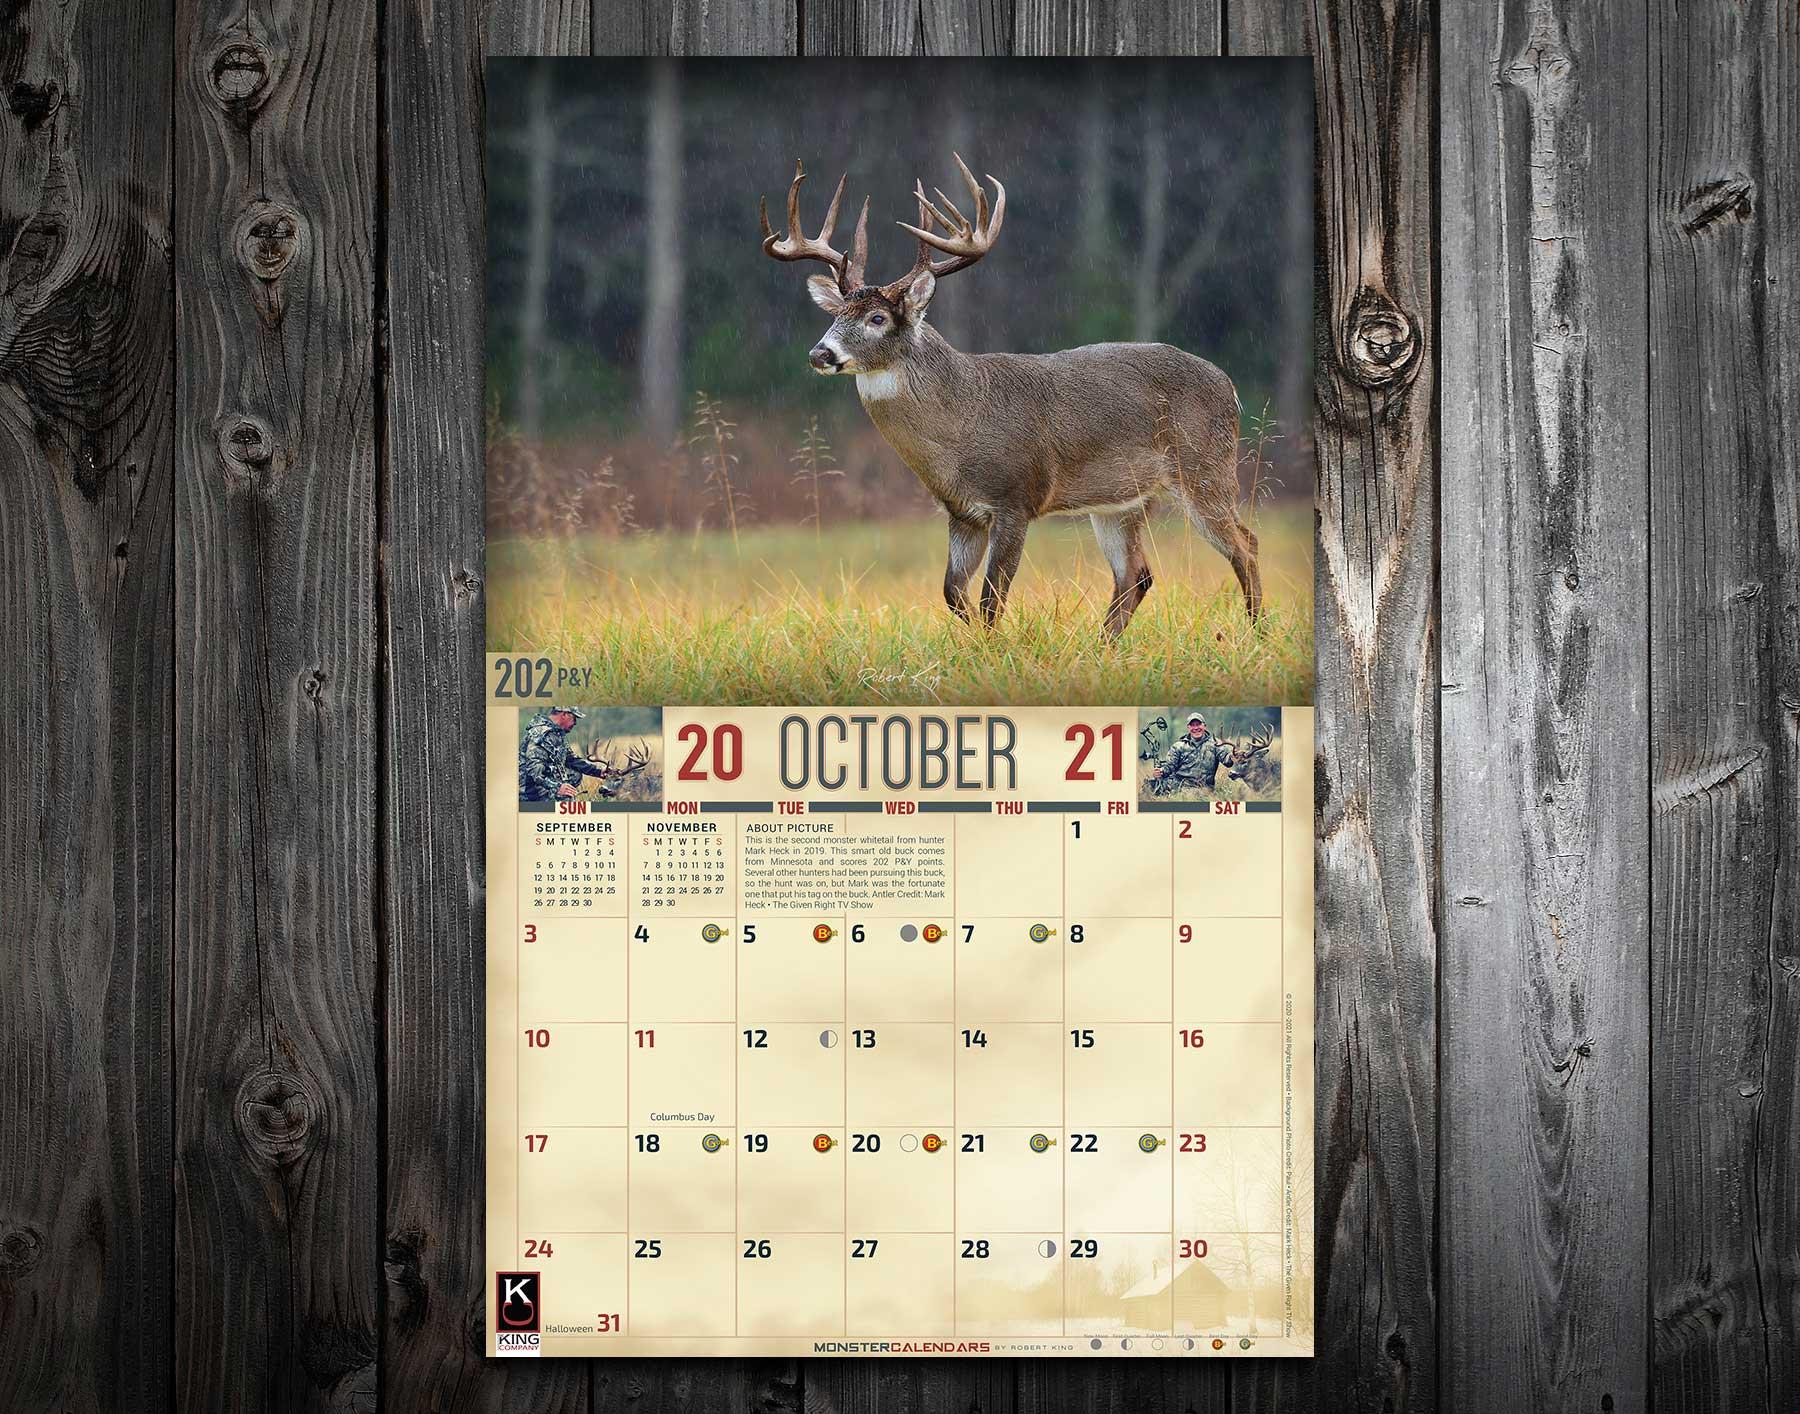 Deer Rut Calendar 2021 | 2022 Calendar-Whitetail Rut Peak 2021